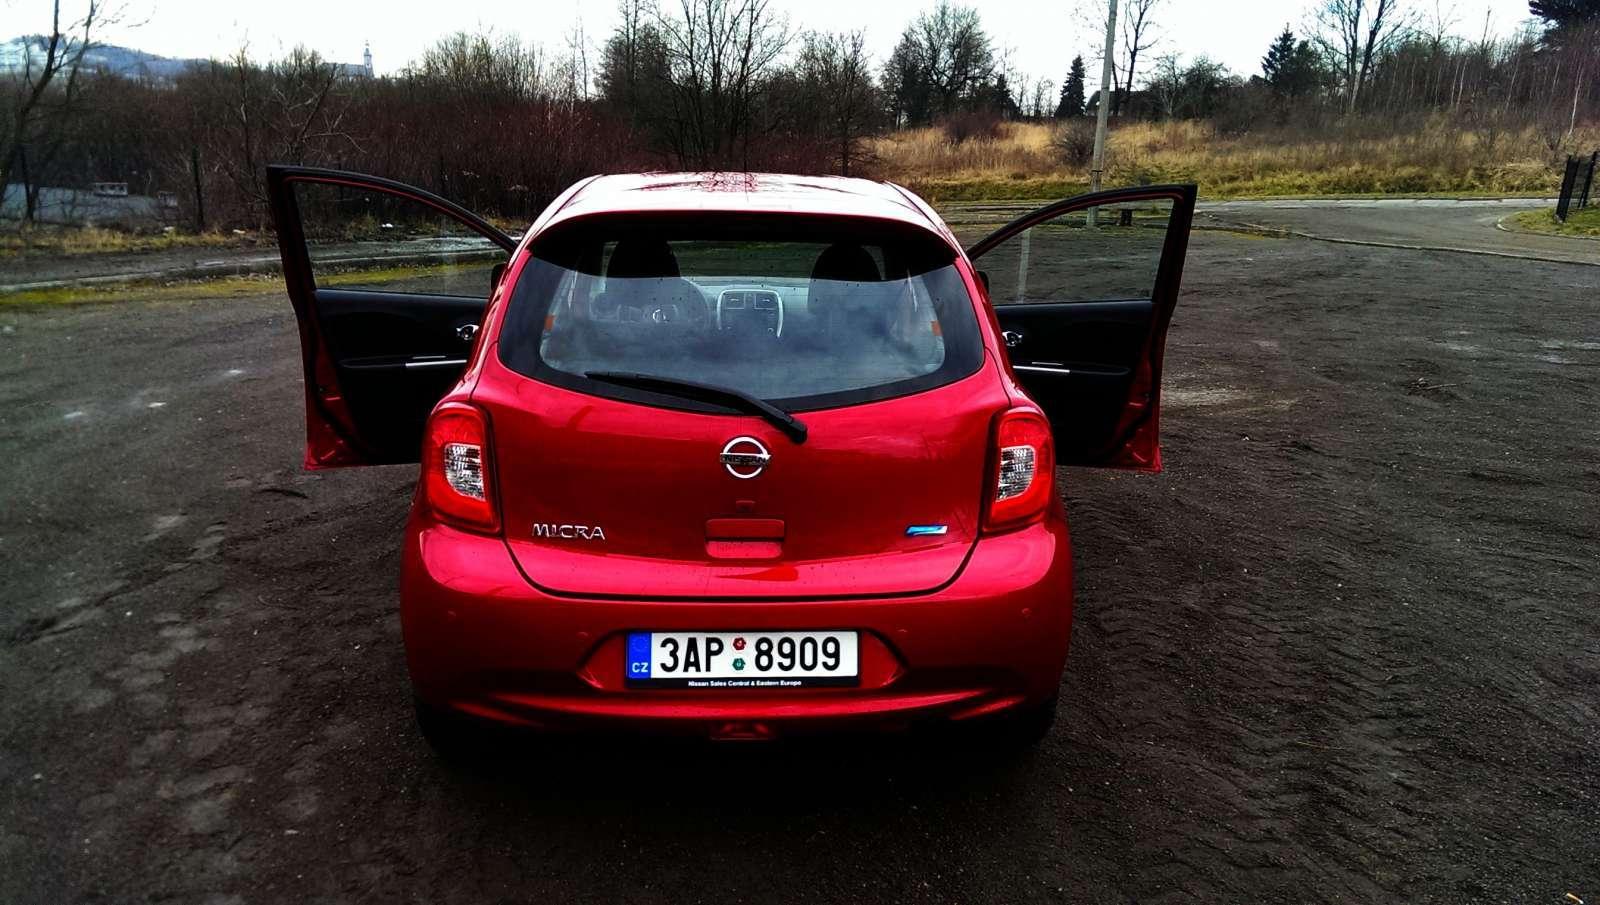 Nowy Nissan Micra 2013